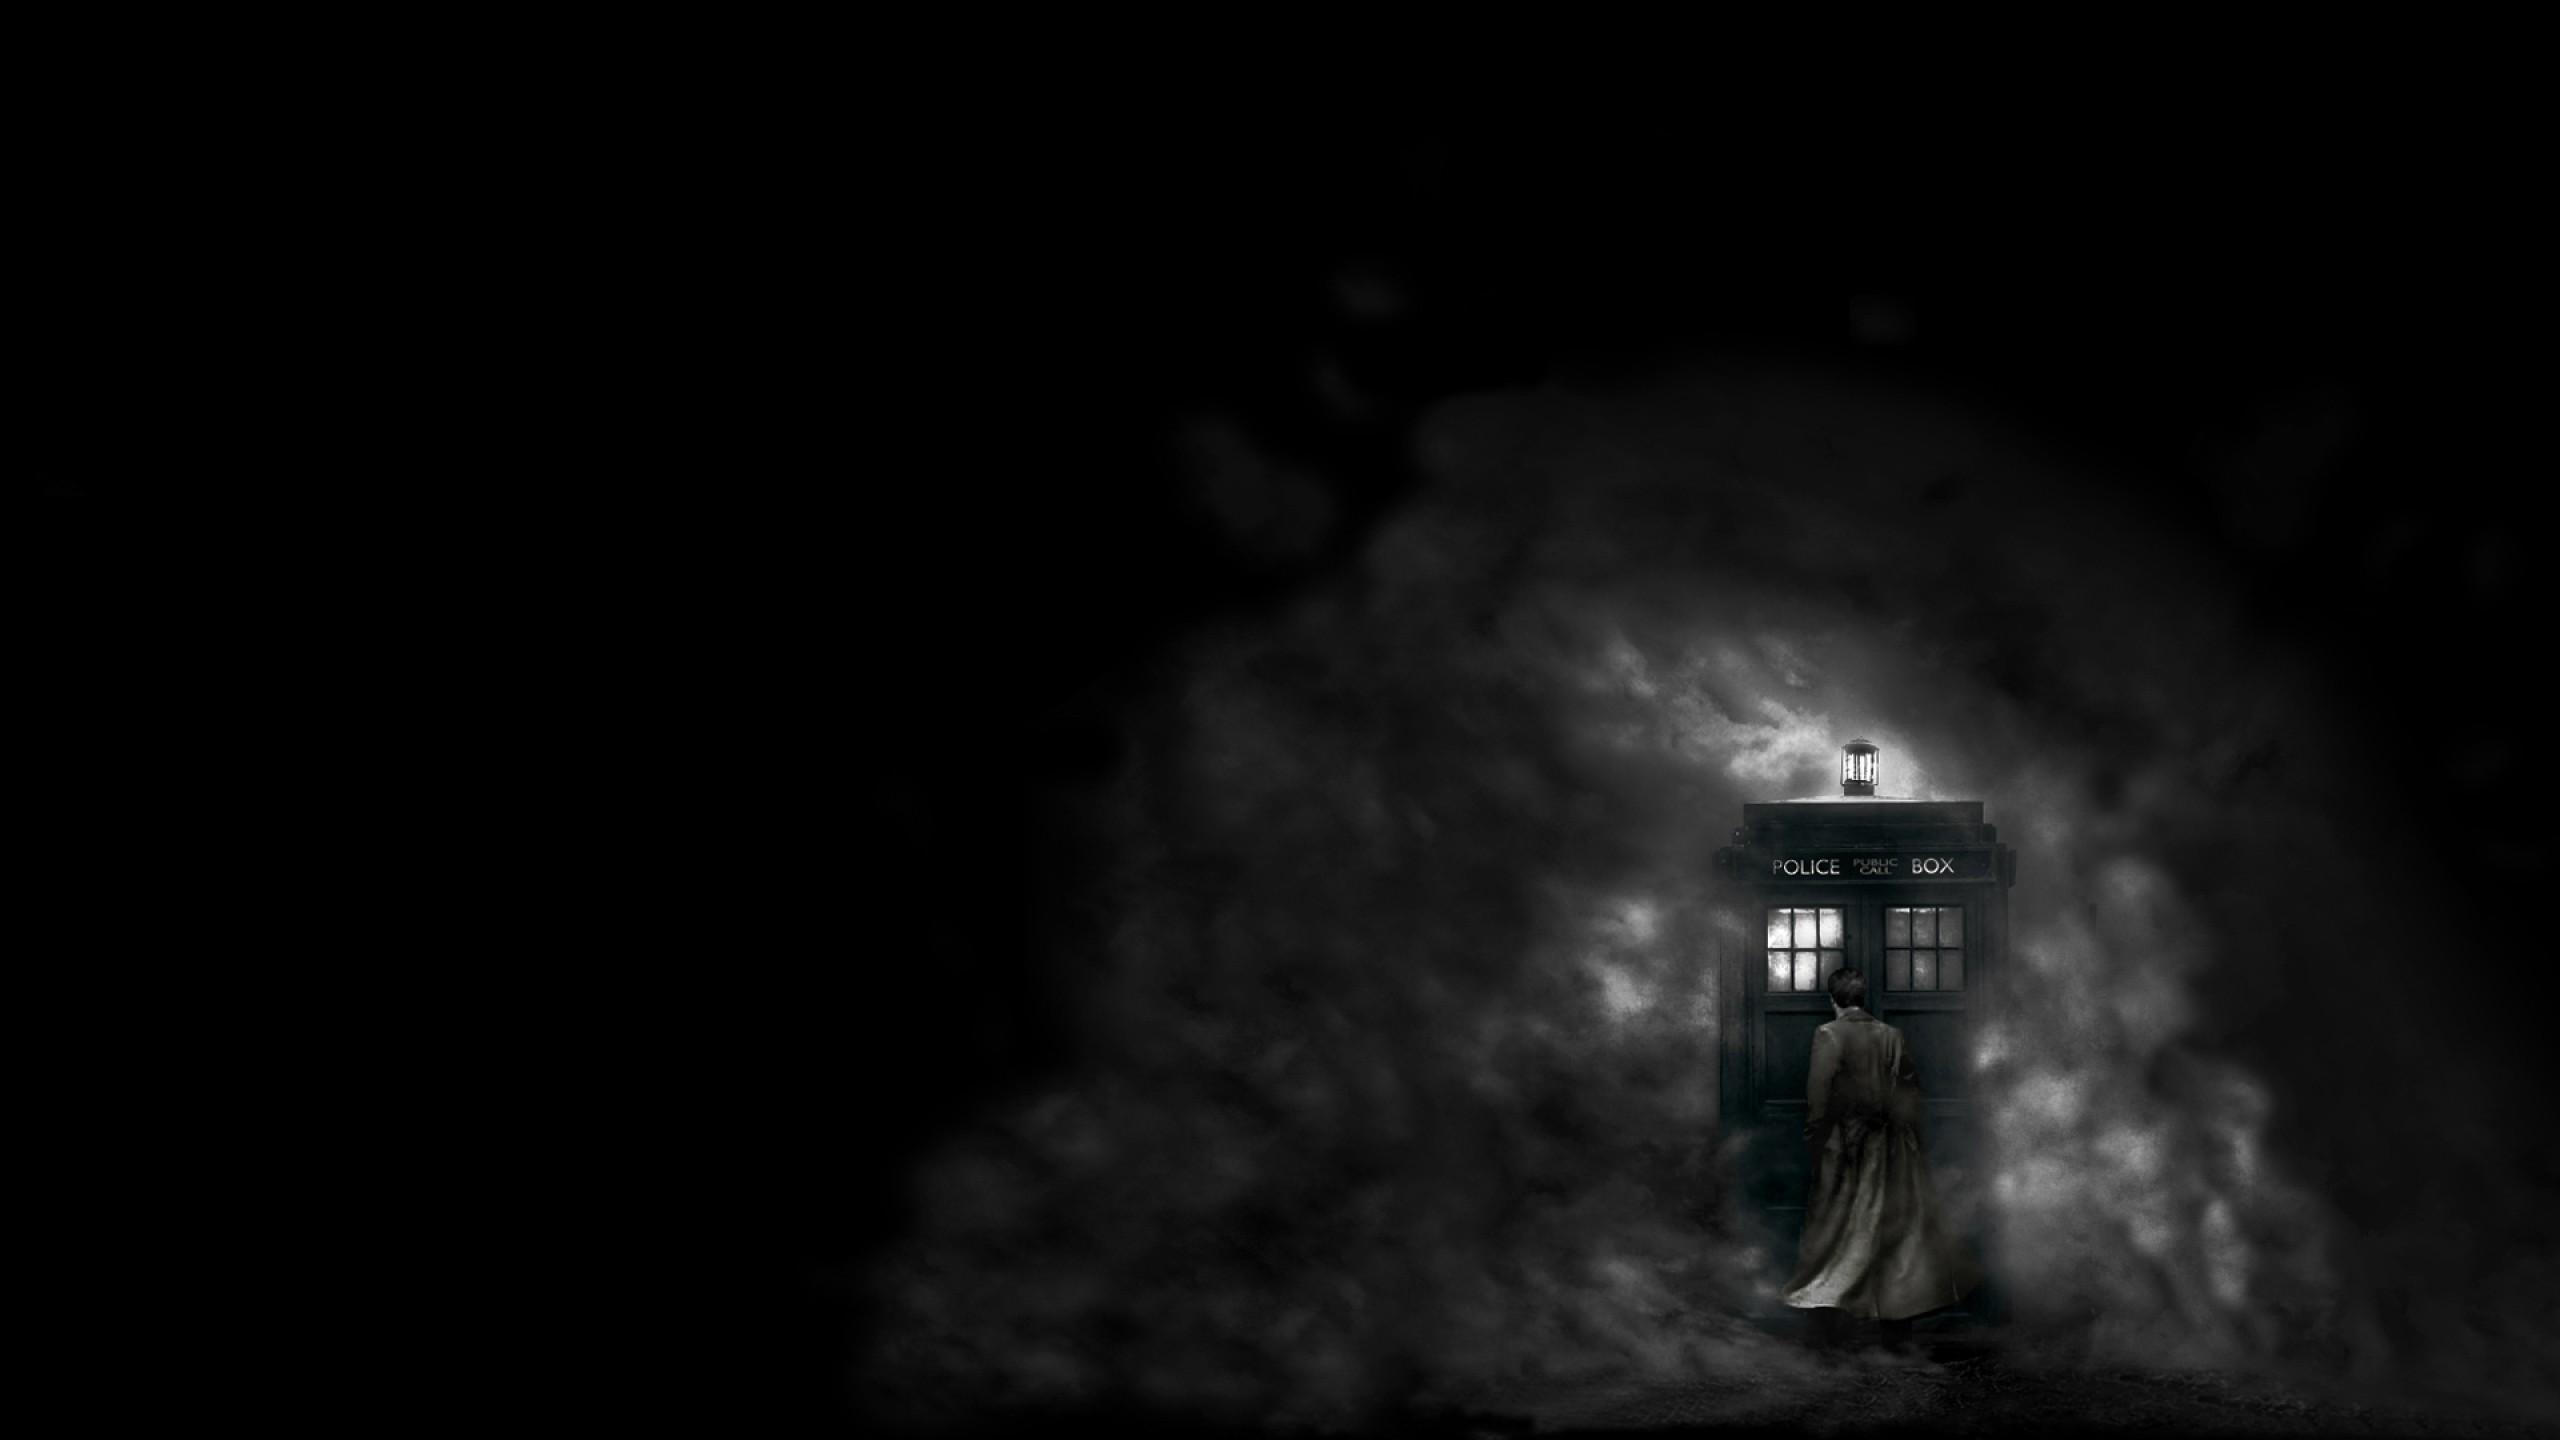 tardis david tennant doctor who tenth doctor 1920×1080 wallpaper Art HD  Wallpaper